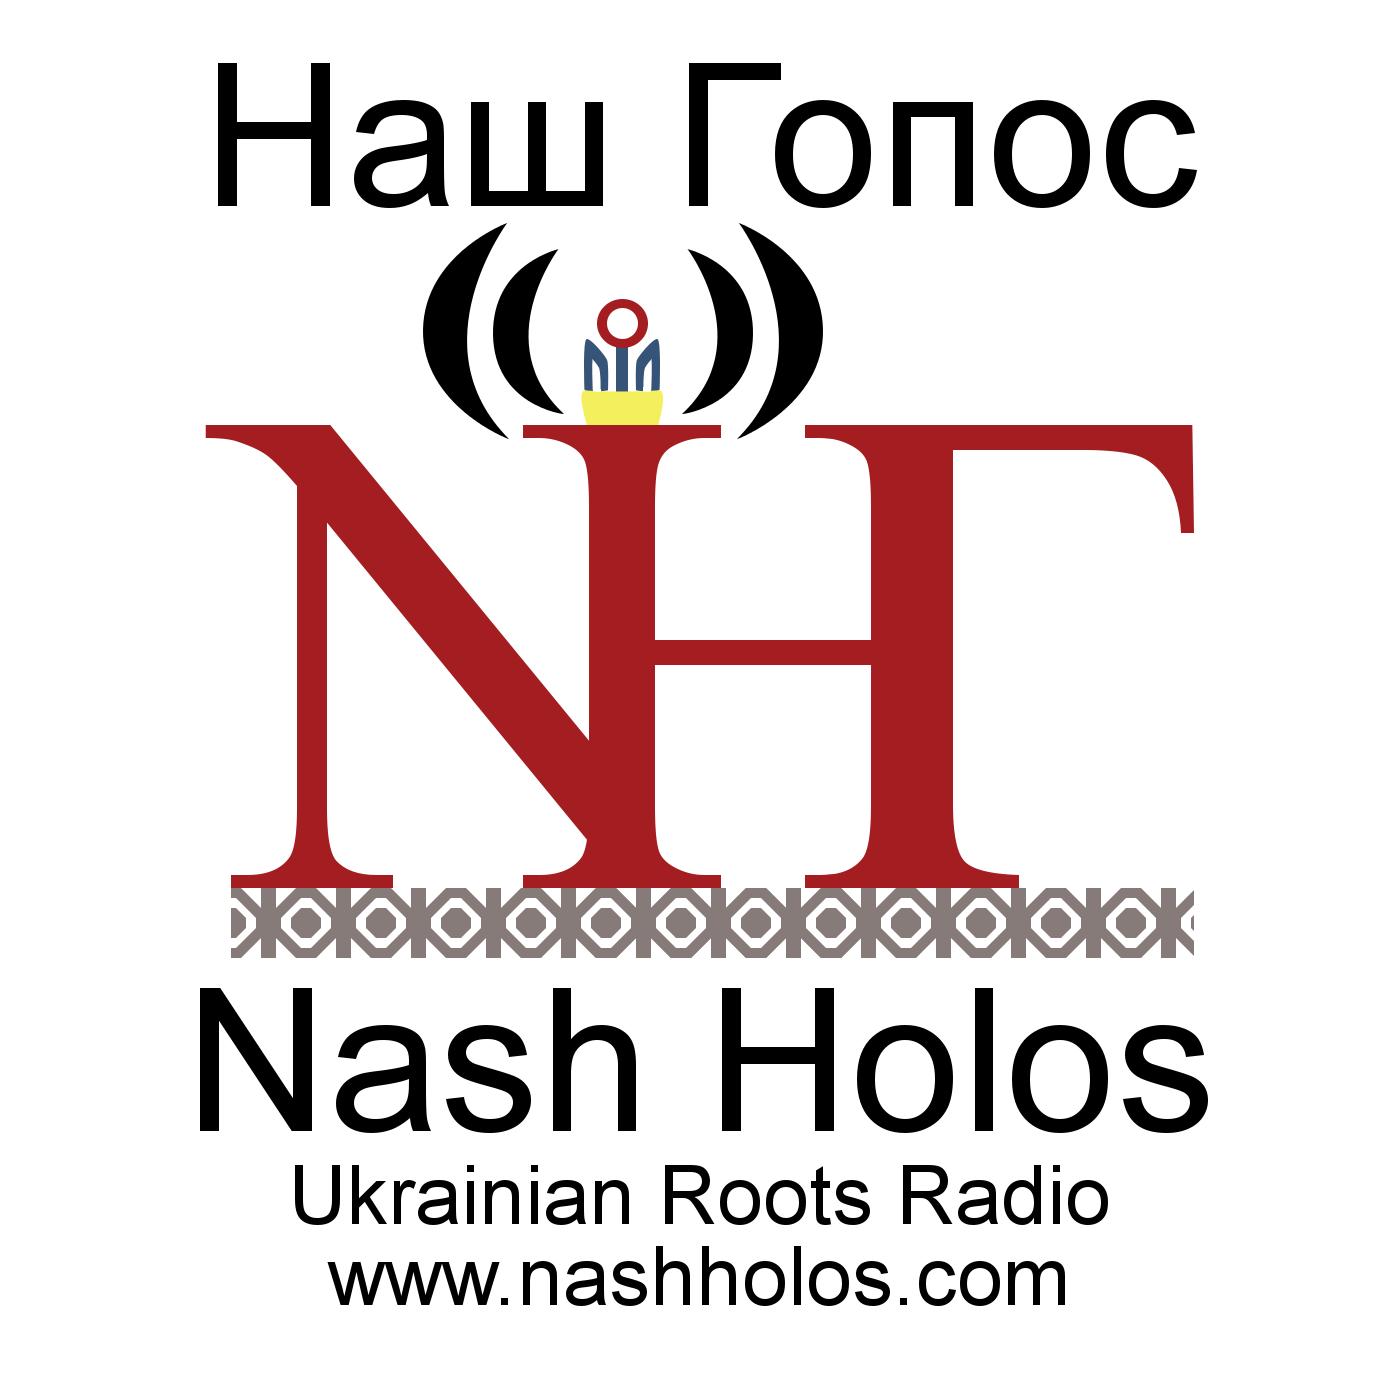 Nash Holos Vancouver